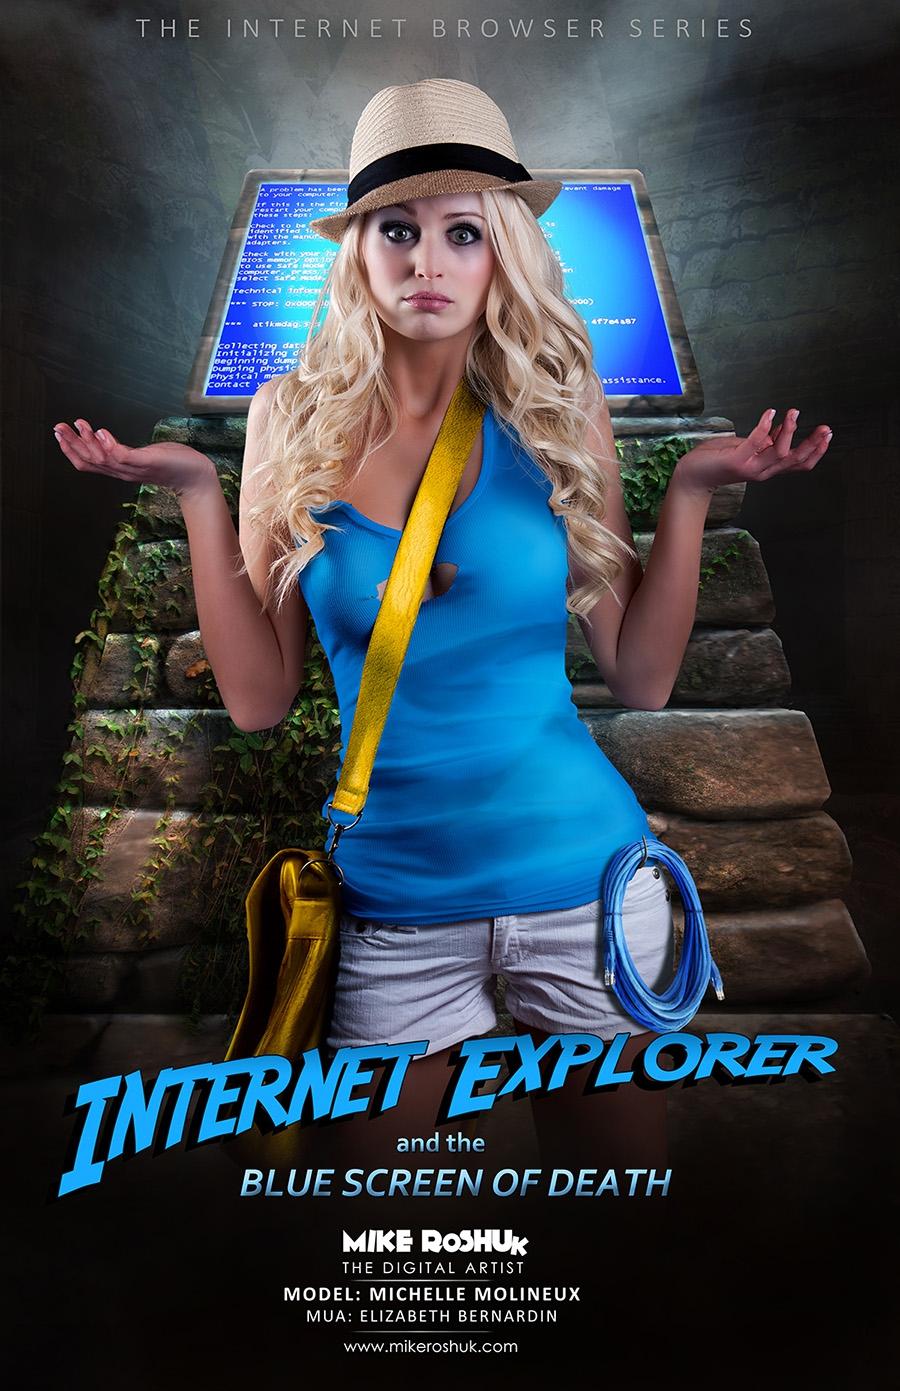 Internet Explorer IE, chrome, netscape, браузеры, девушки, опера, сафари